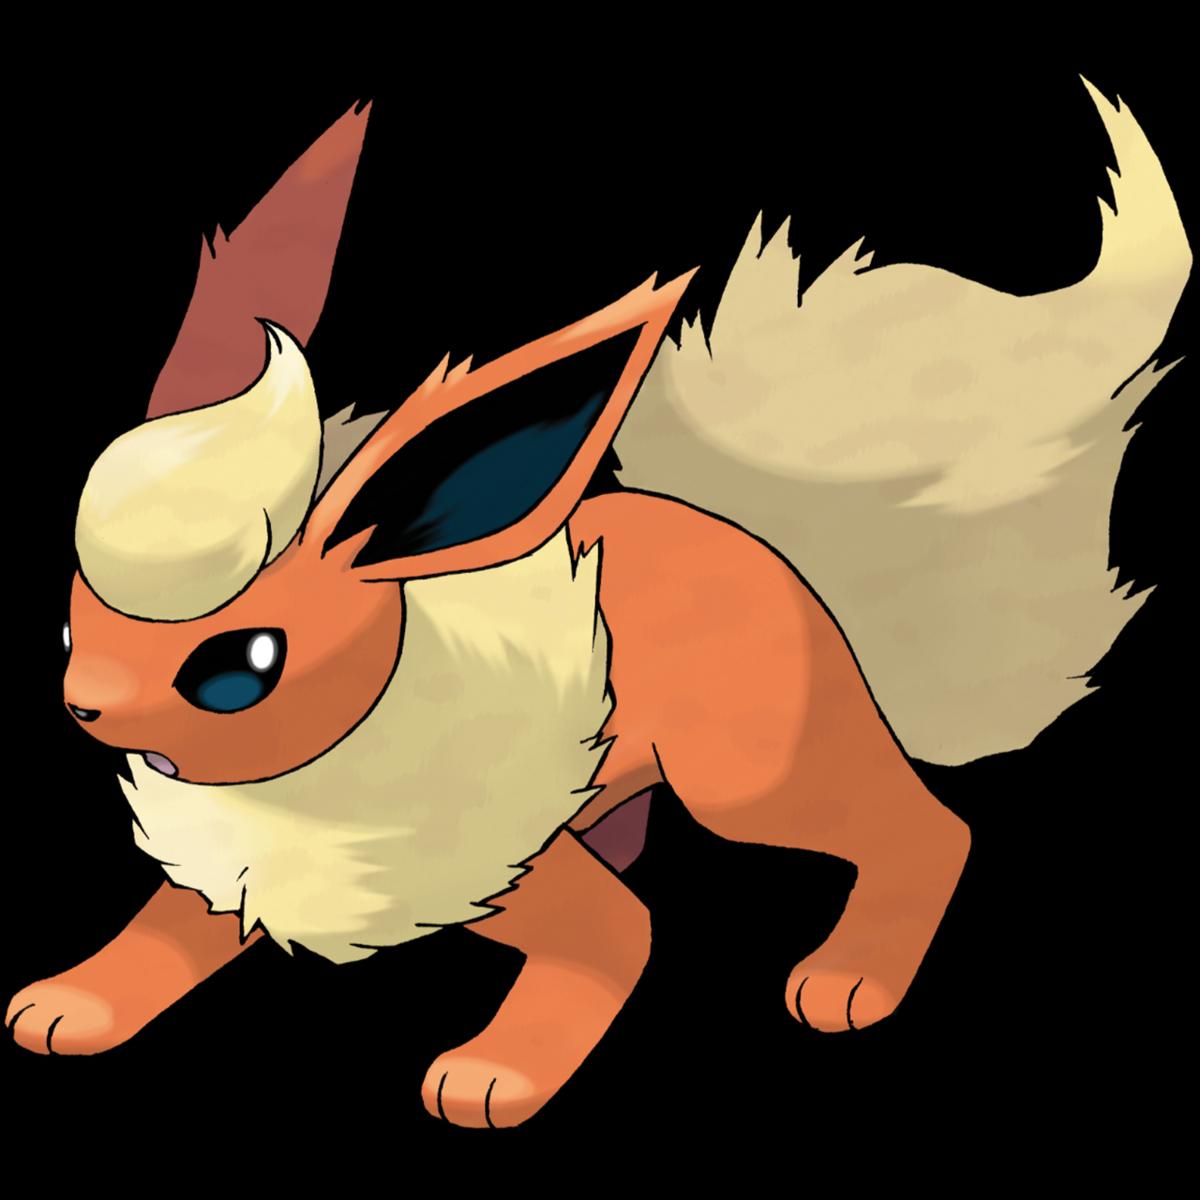 Flareon (Pokémon).